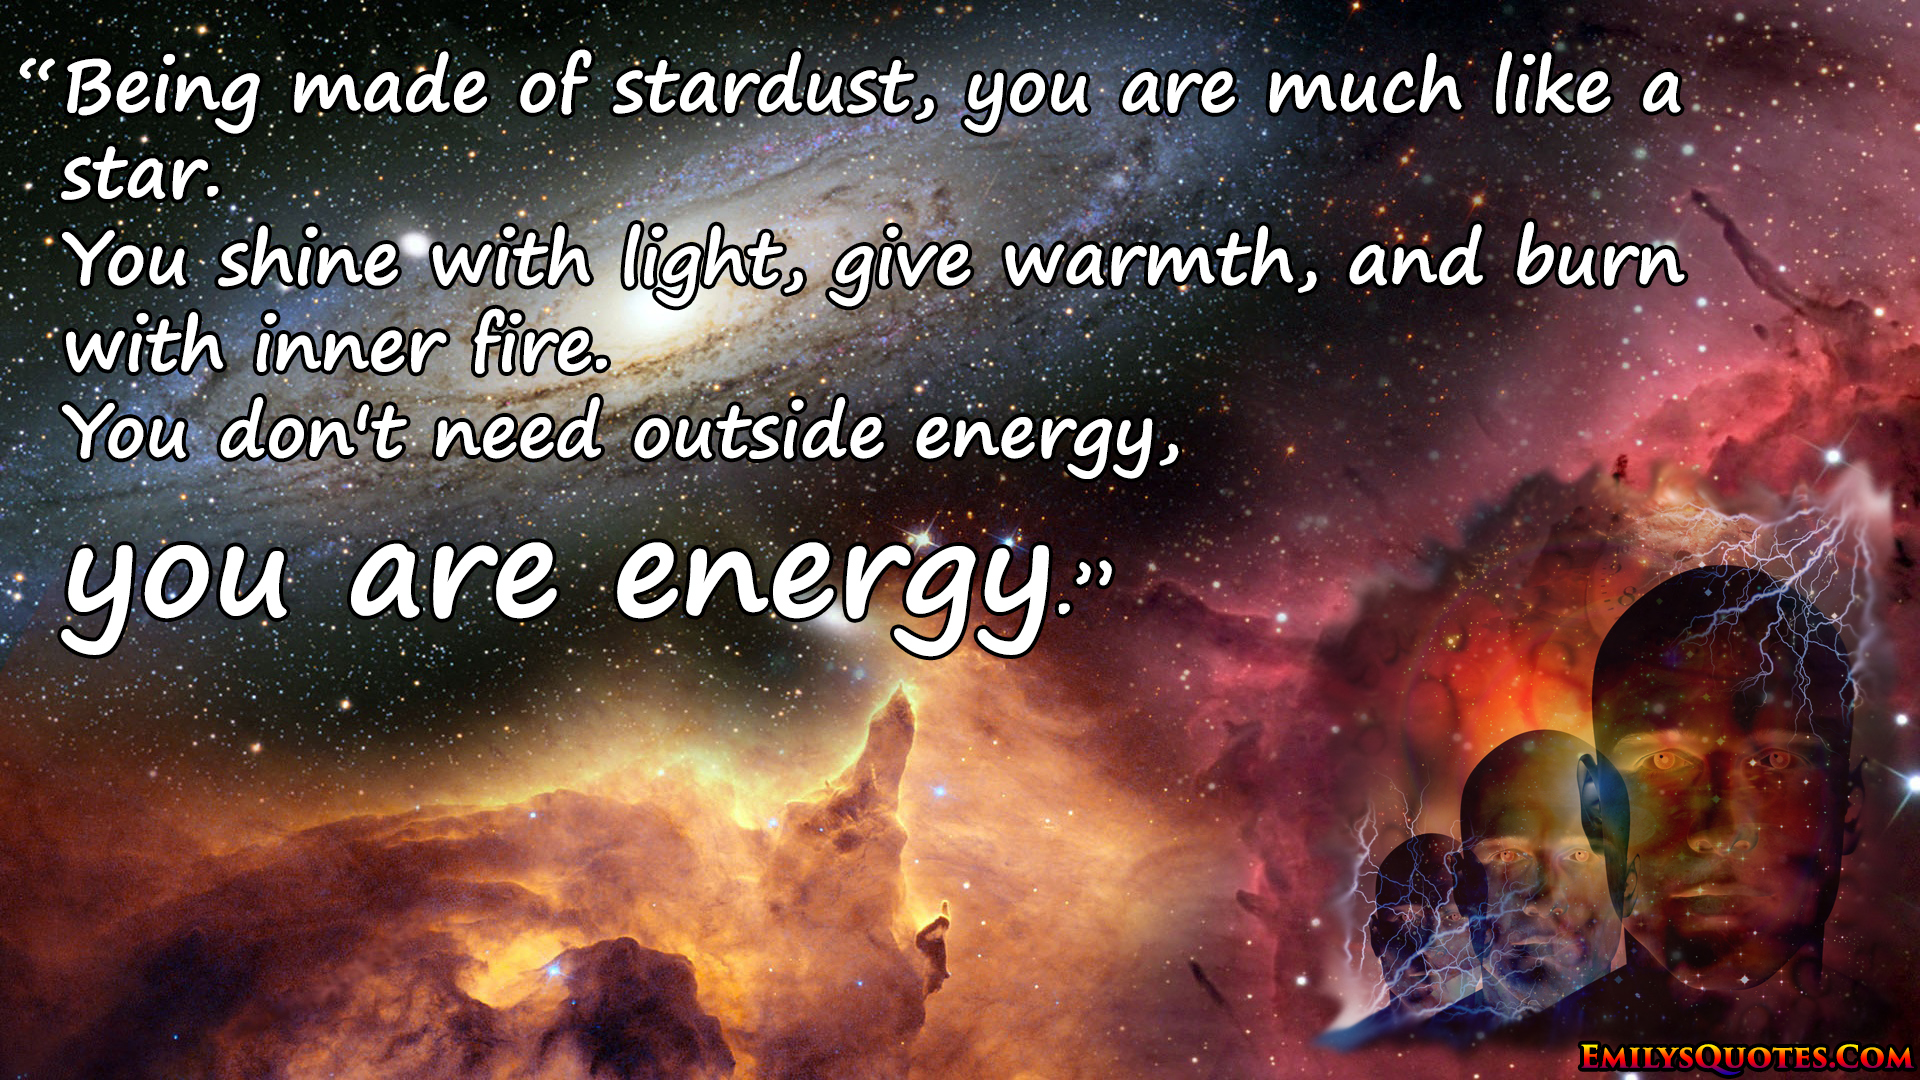 EmilysQuotes.Com - Intelligence, wisdom, energy, stardust, energy, inner fire, inspirational